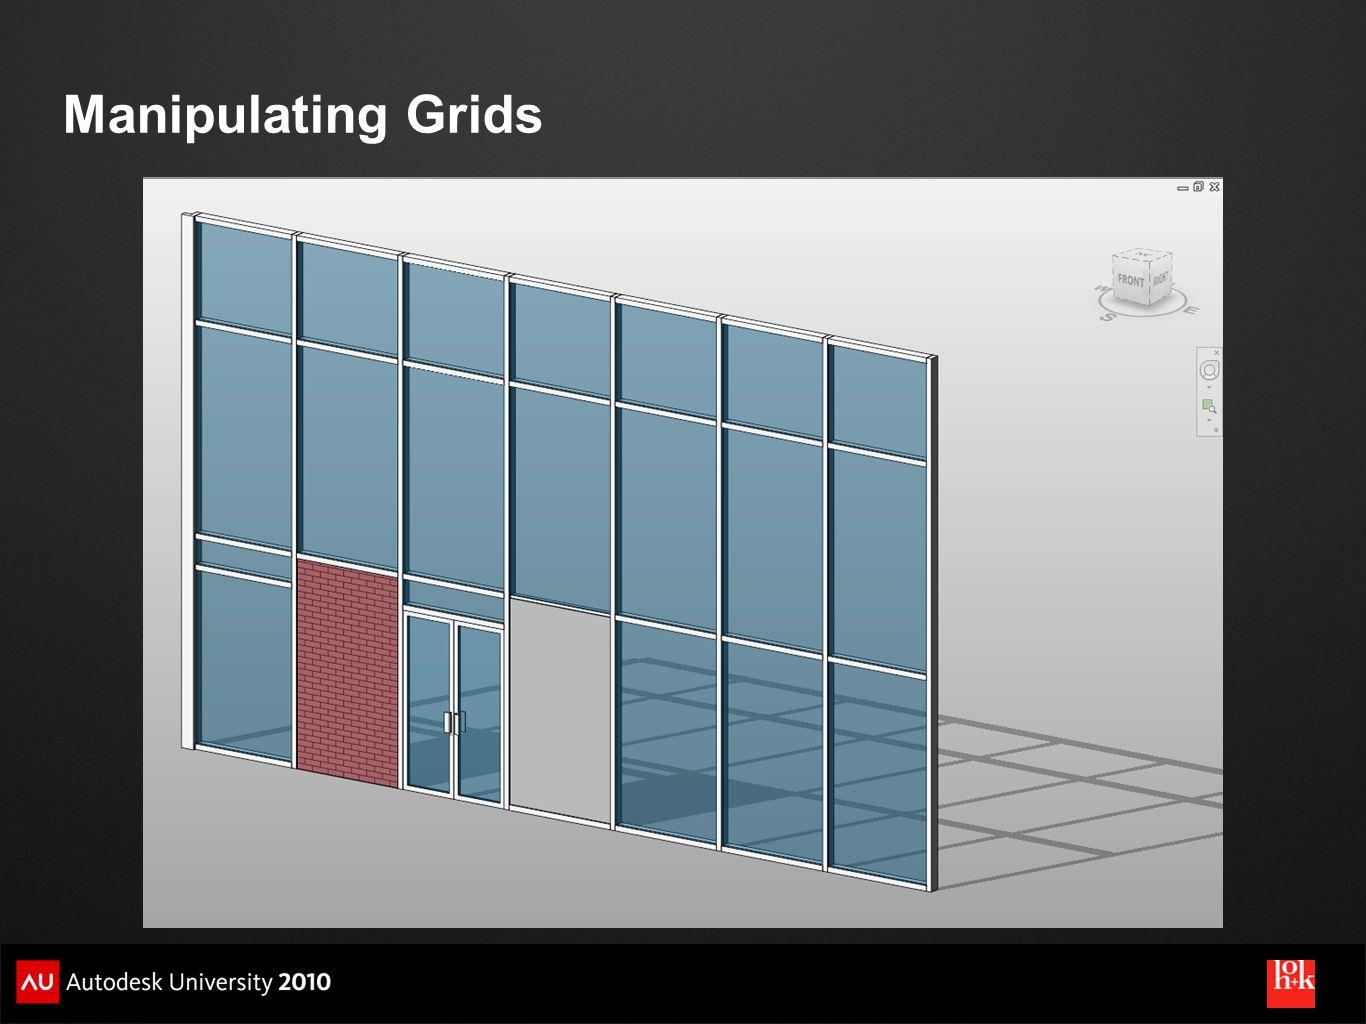 Manipulating Grids